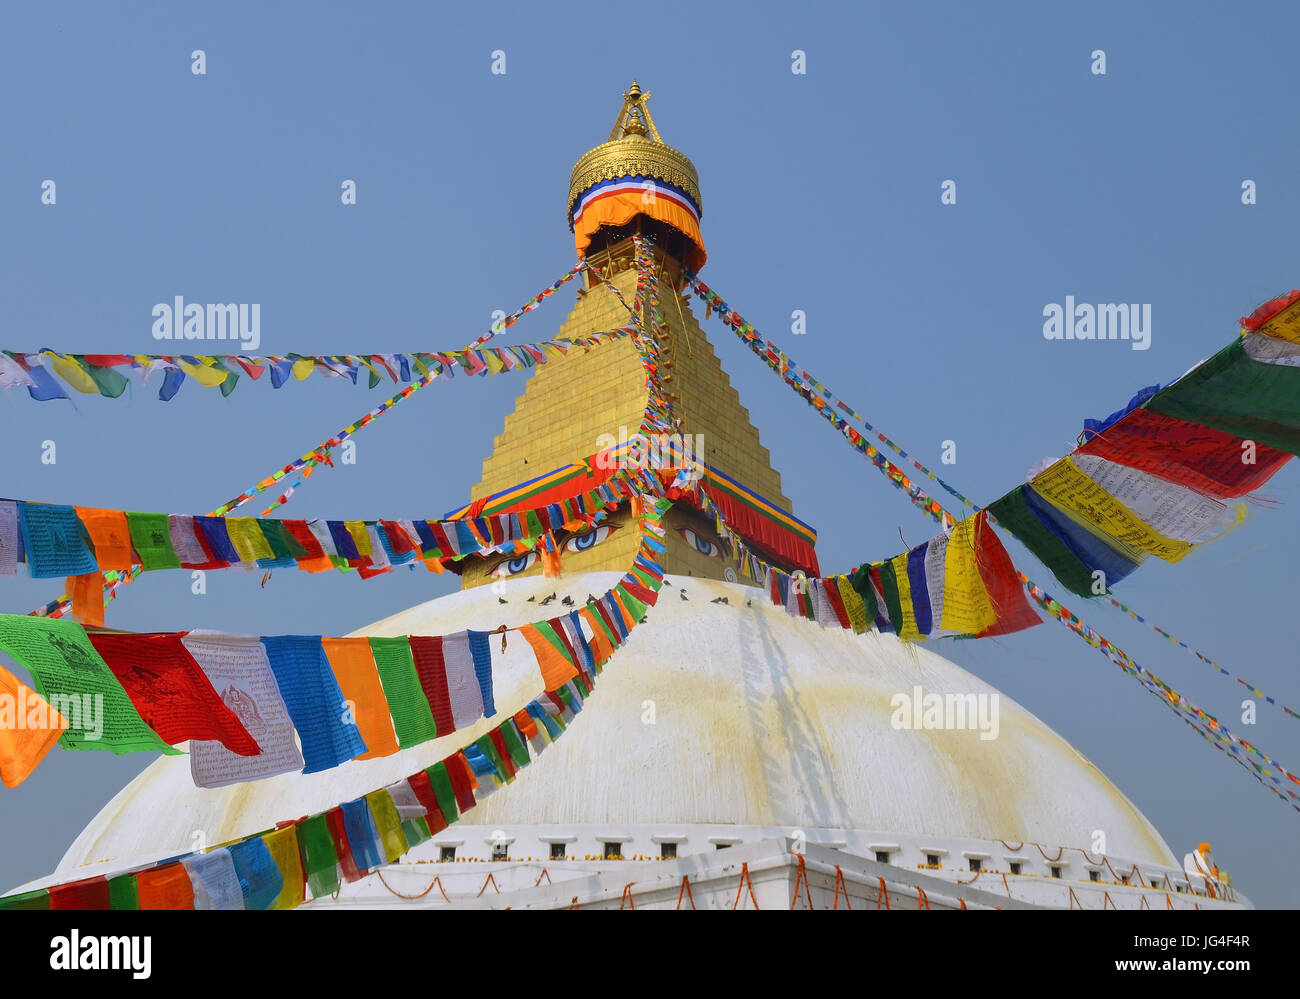 Flags lunghta on The Great stupa Bodnath in Kathmandu - Stock Image